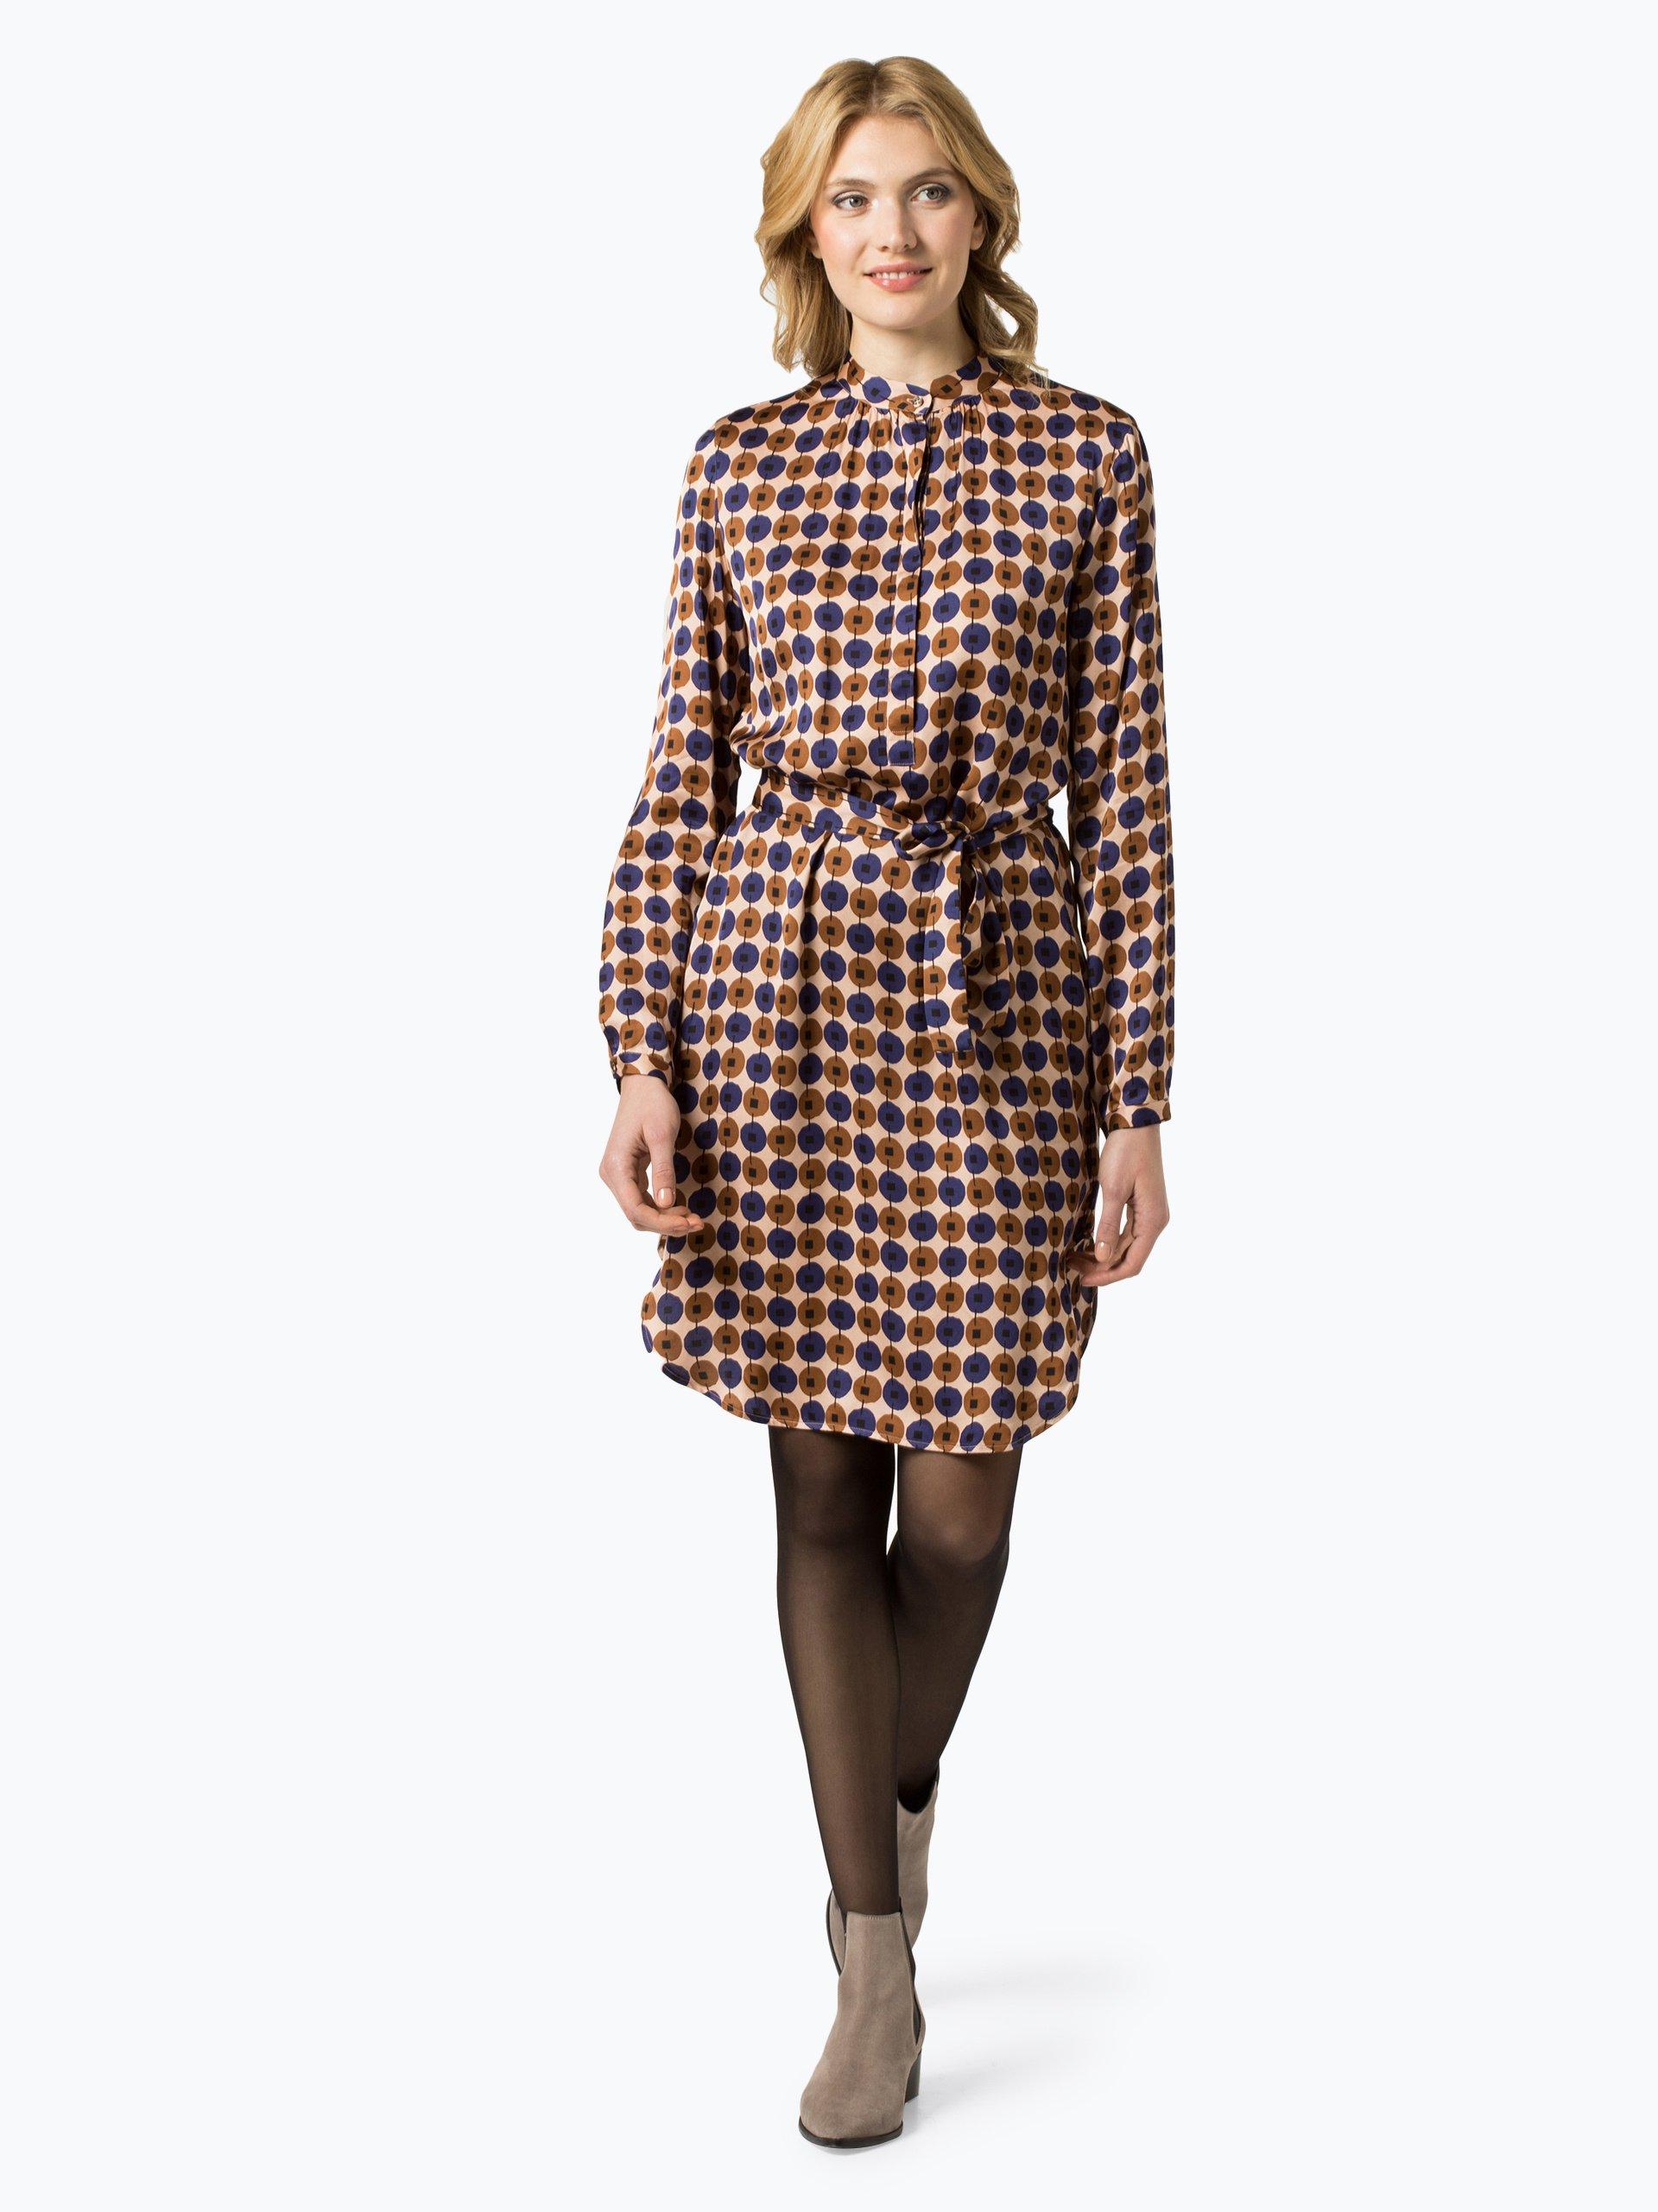 0039 Italy Damen Kleid - Leonora